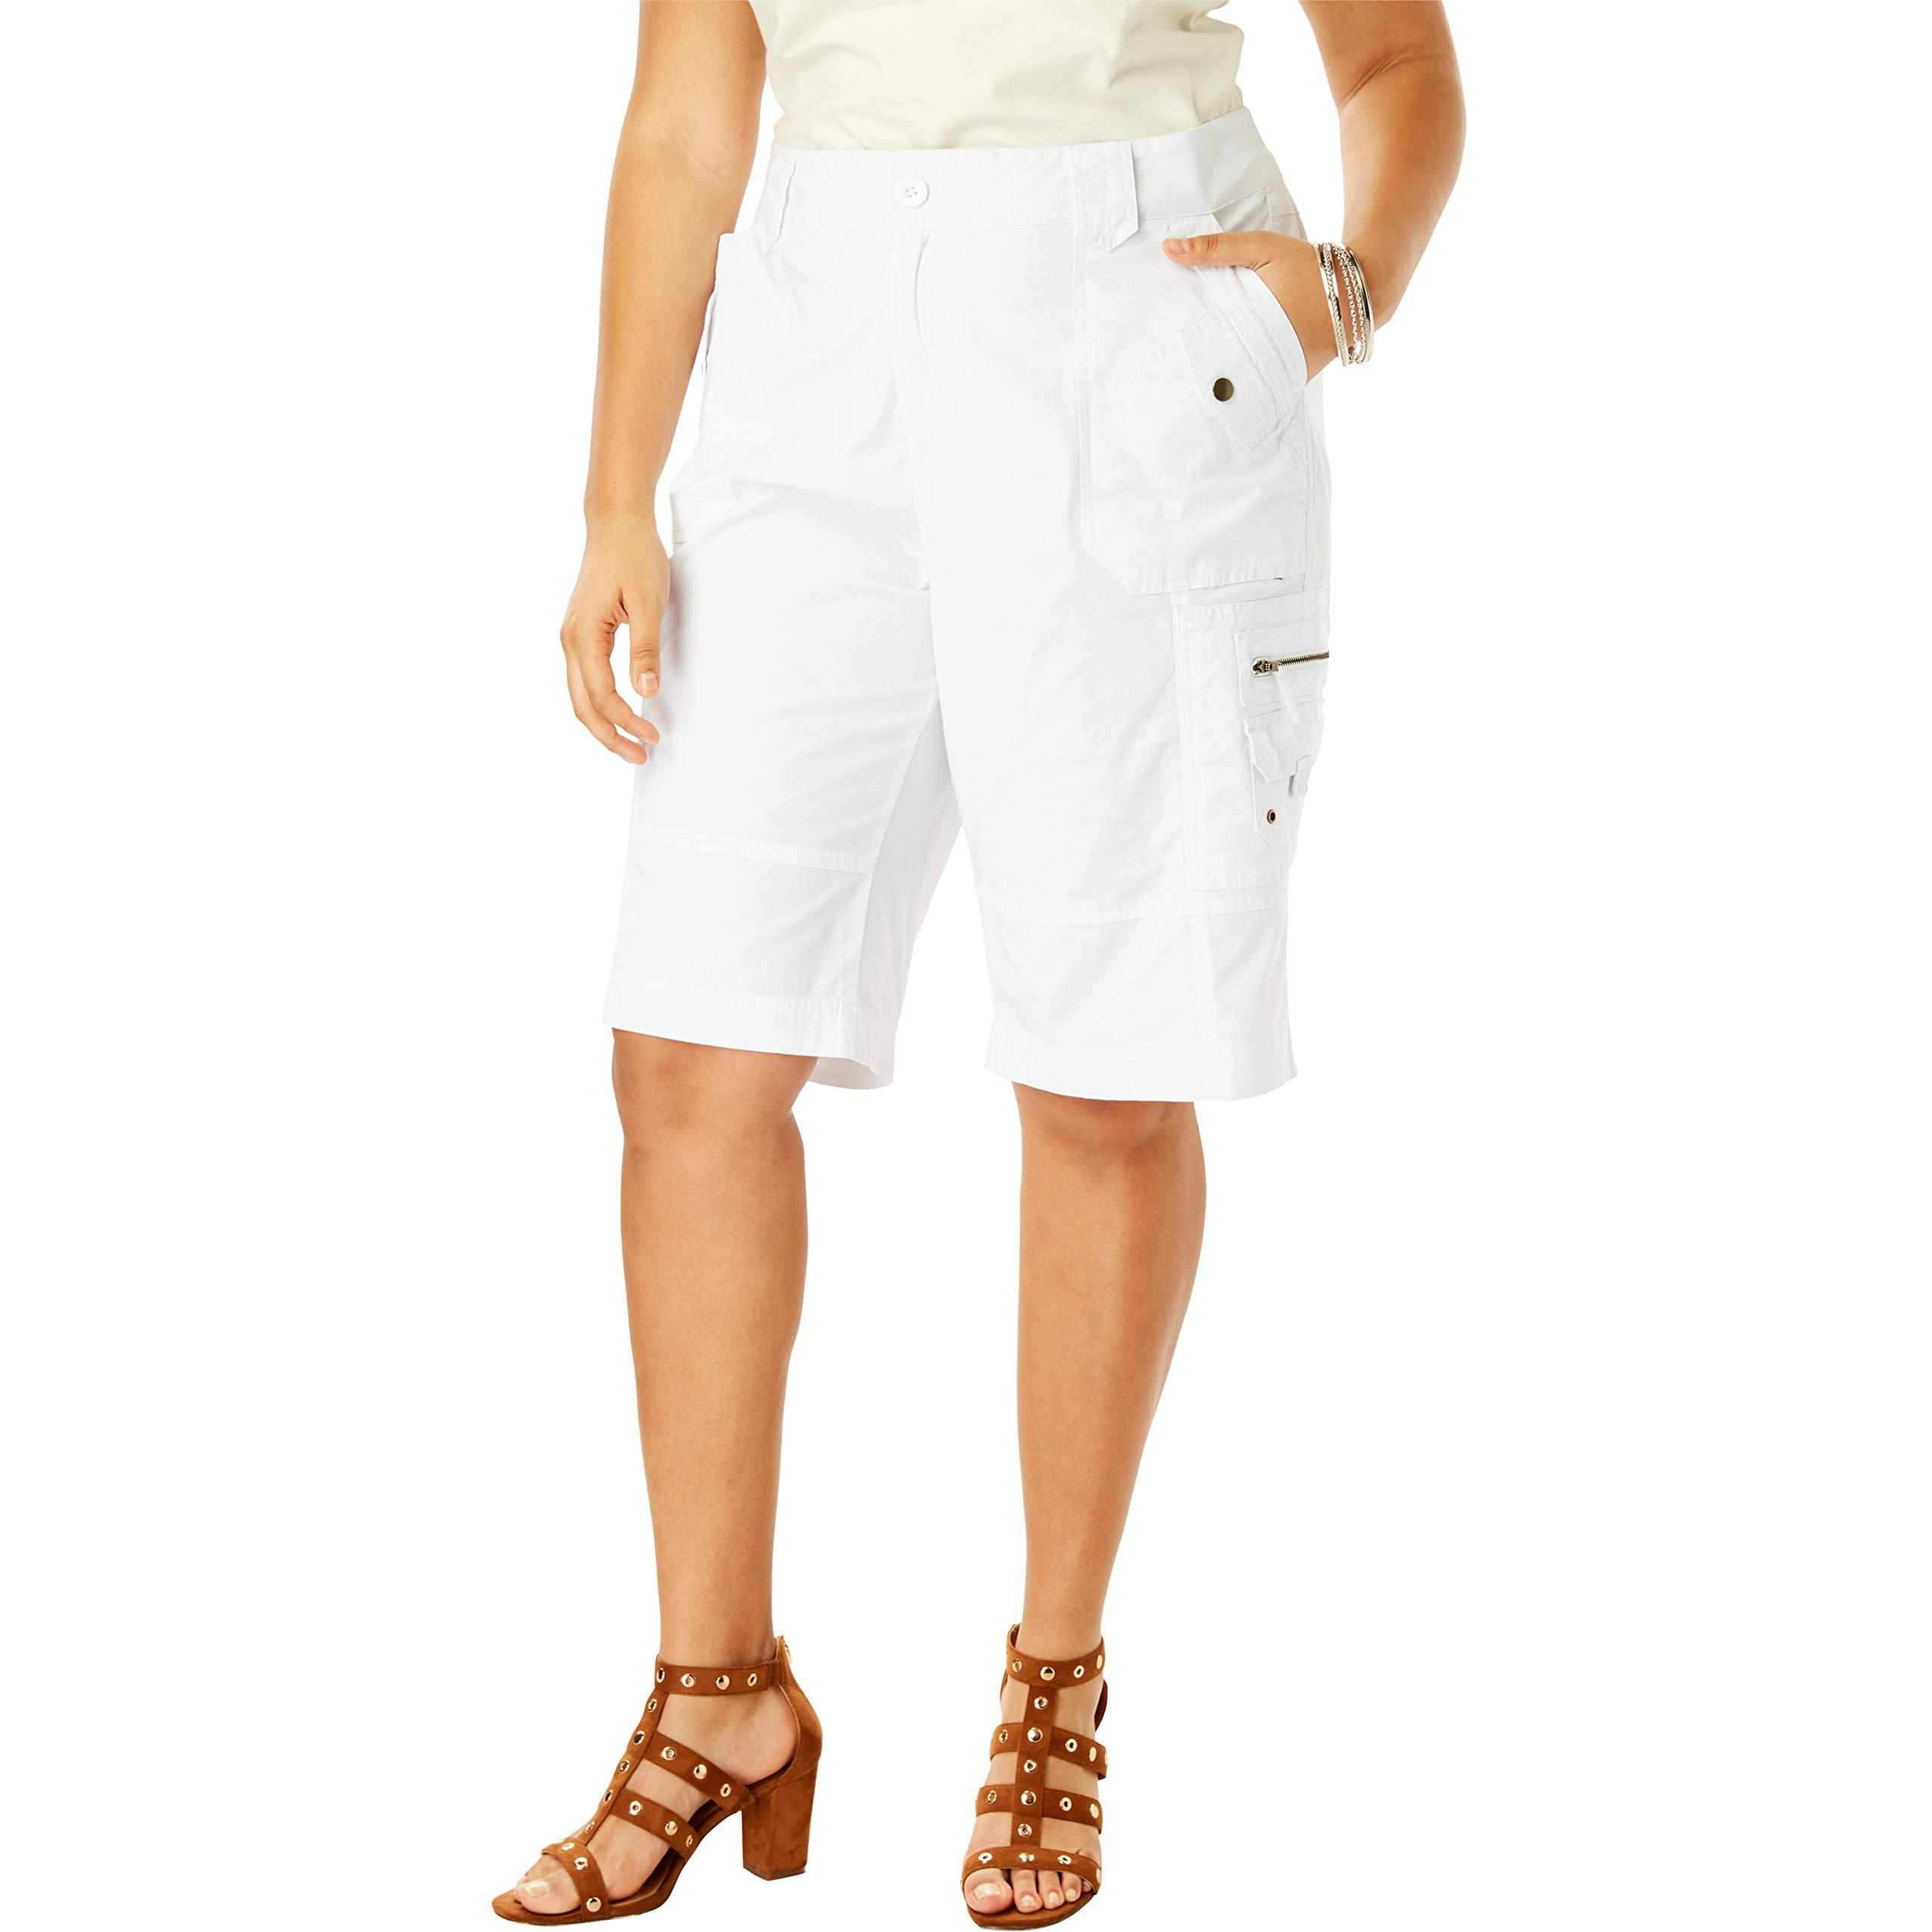 Roamans Women's Plus Size Cargo Shorts - White, 16 W by Roamans